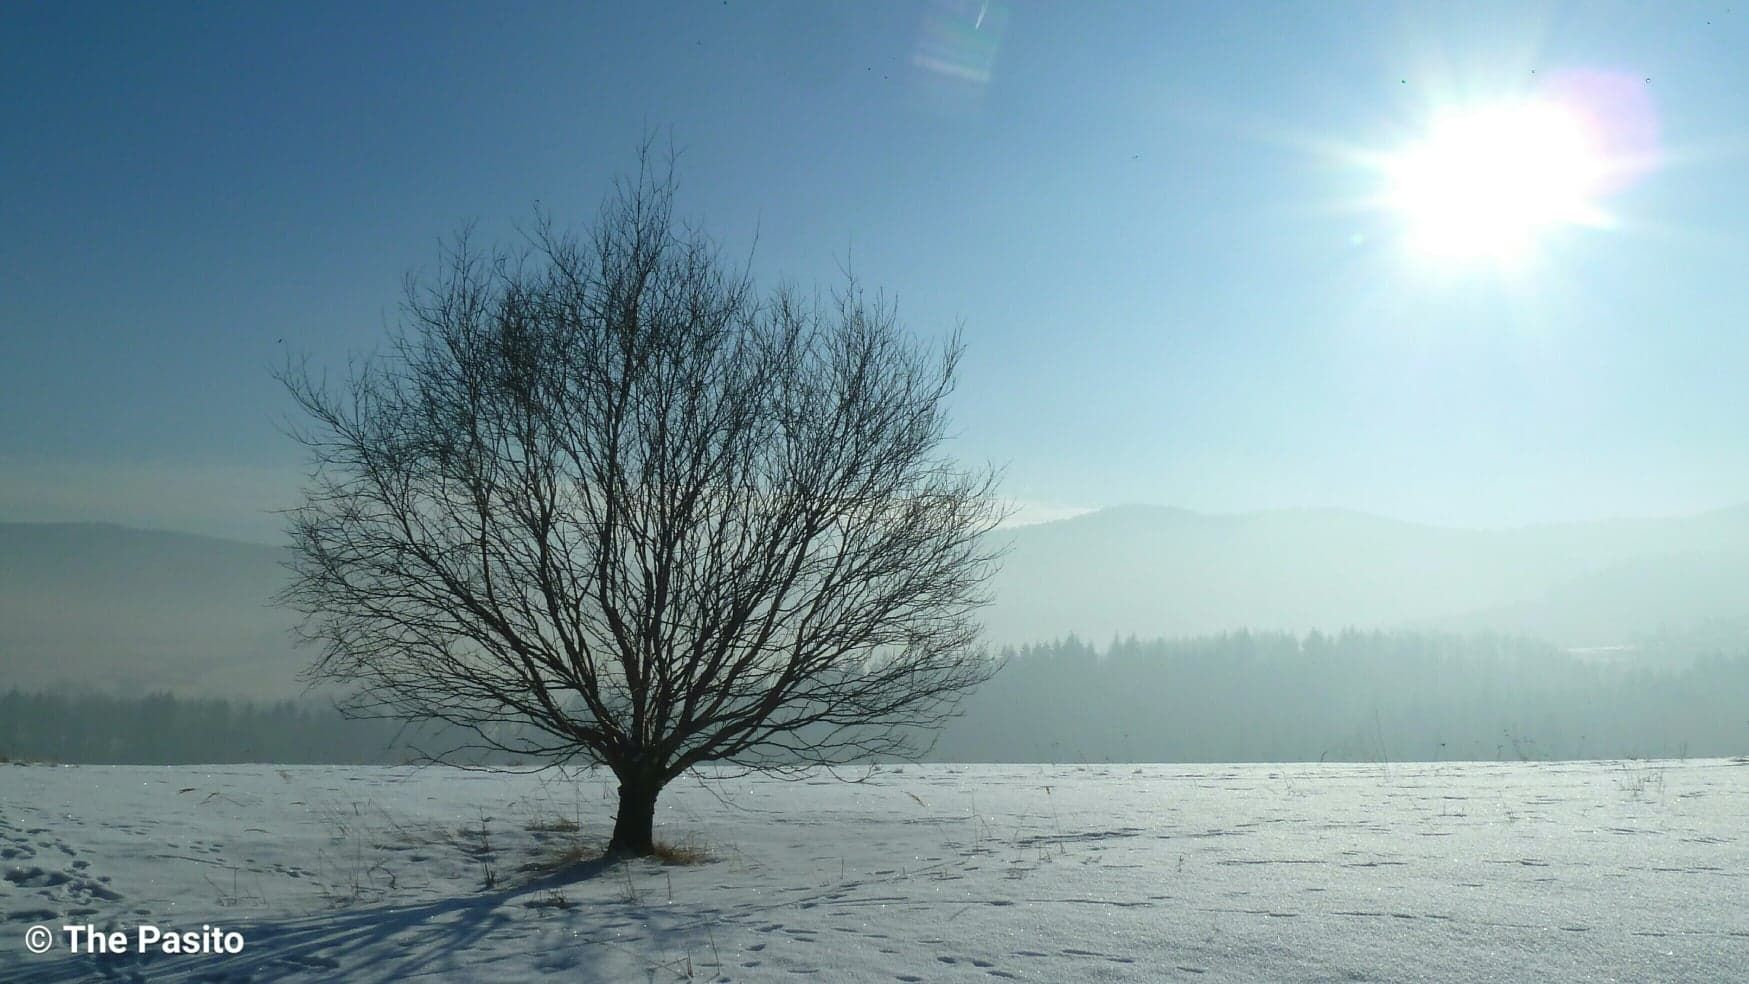 Piękny, mroźny dzień w górach [FOTO]